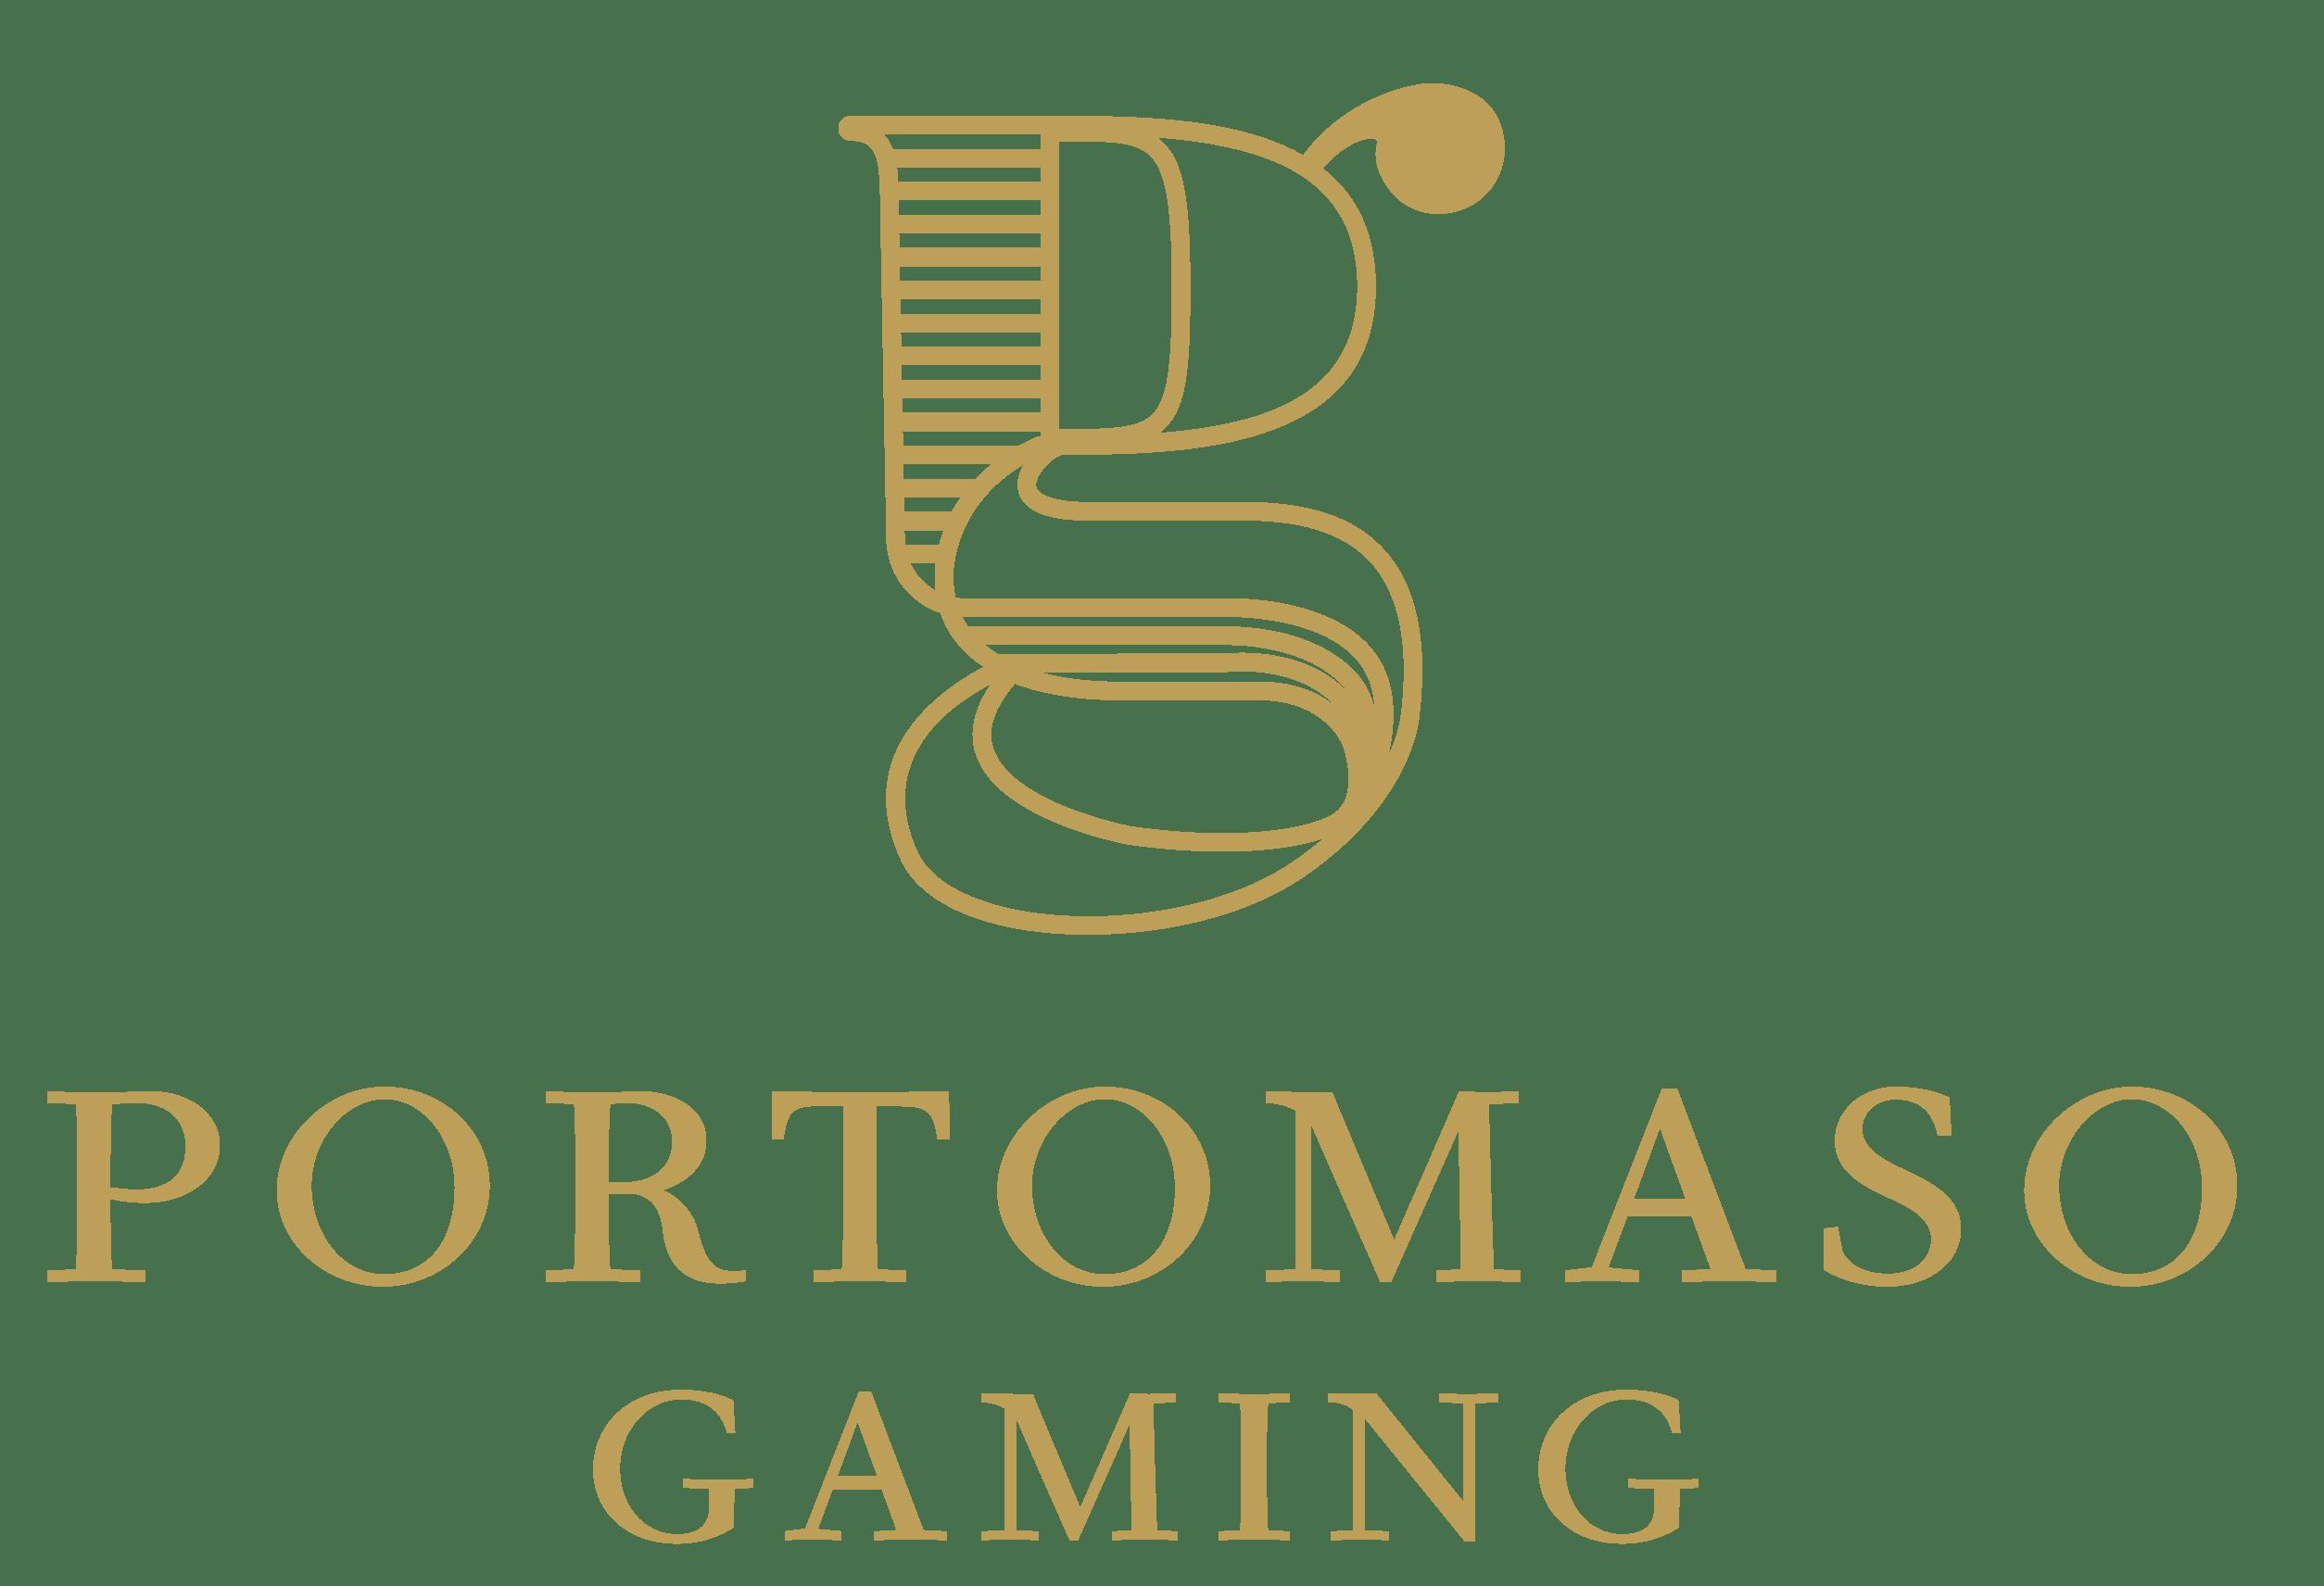 Portomaso best online casino software provider for Australians